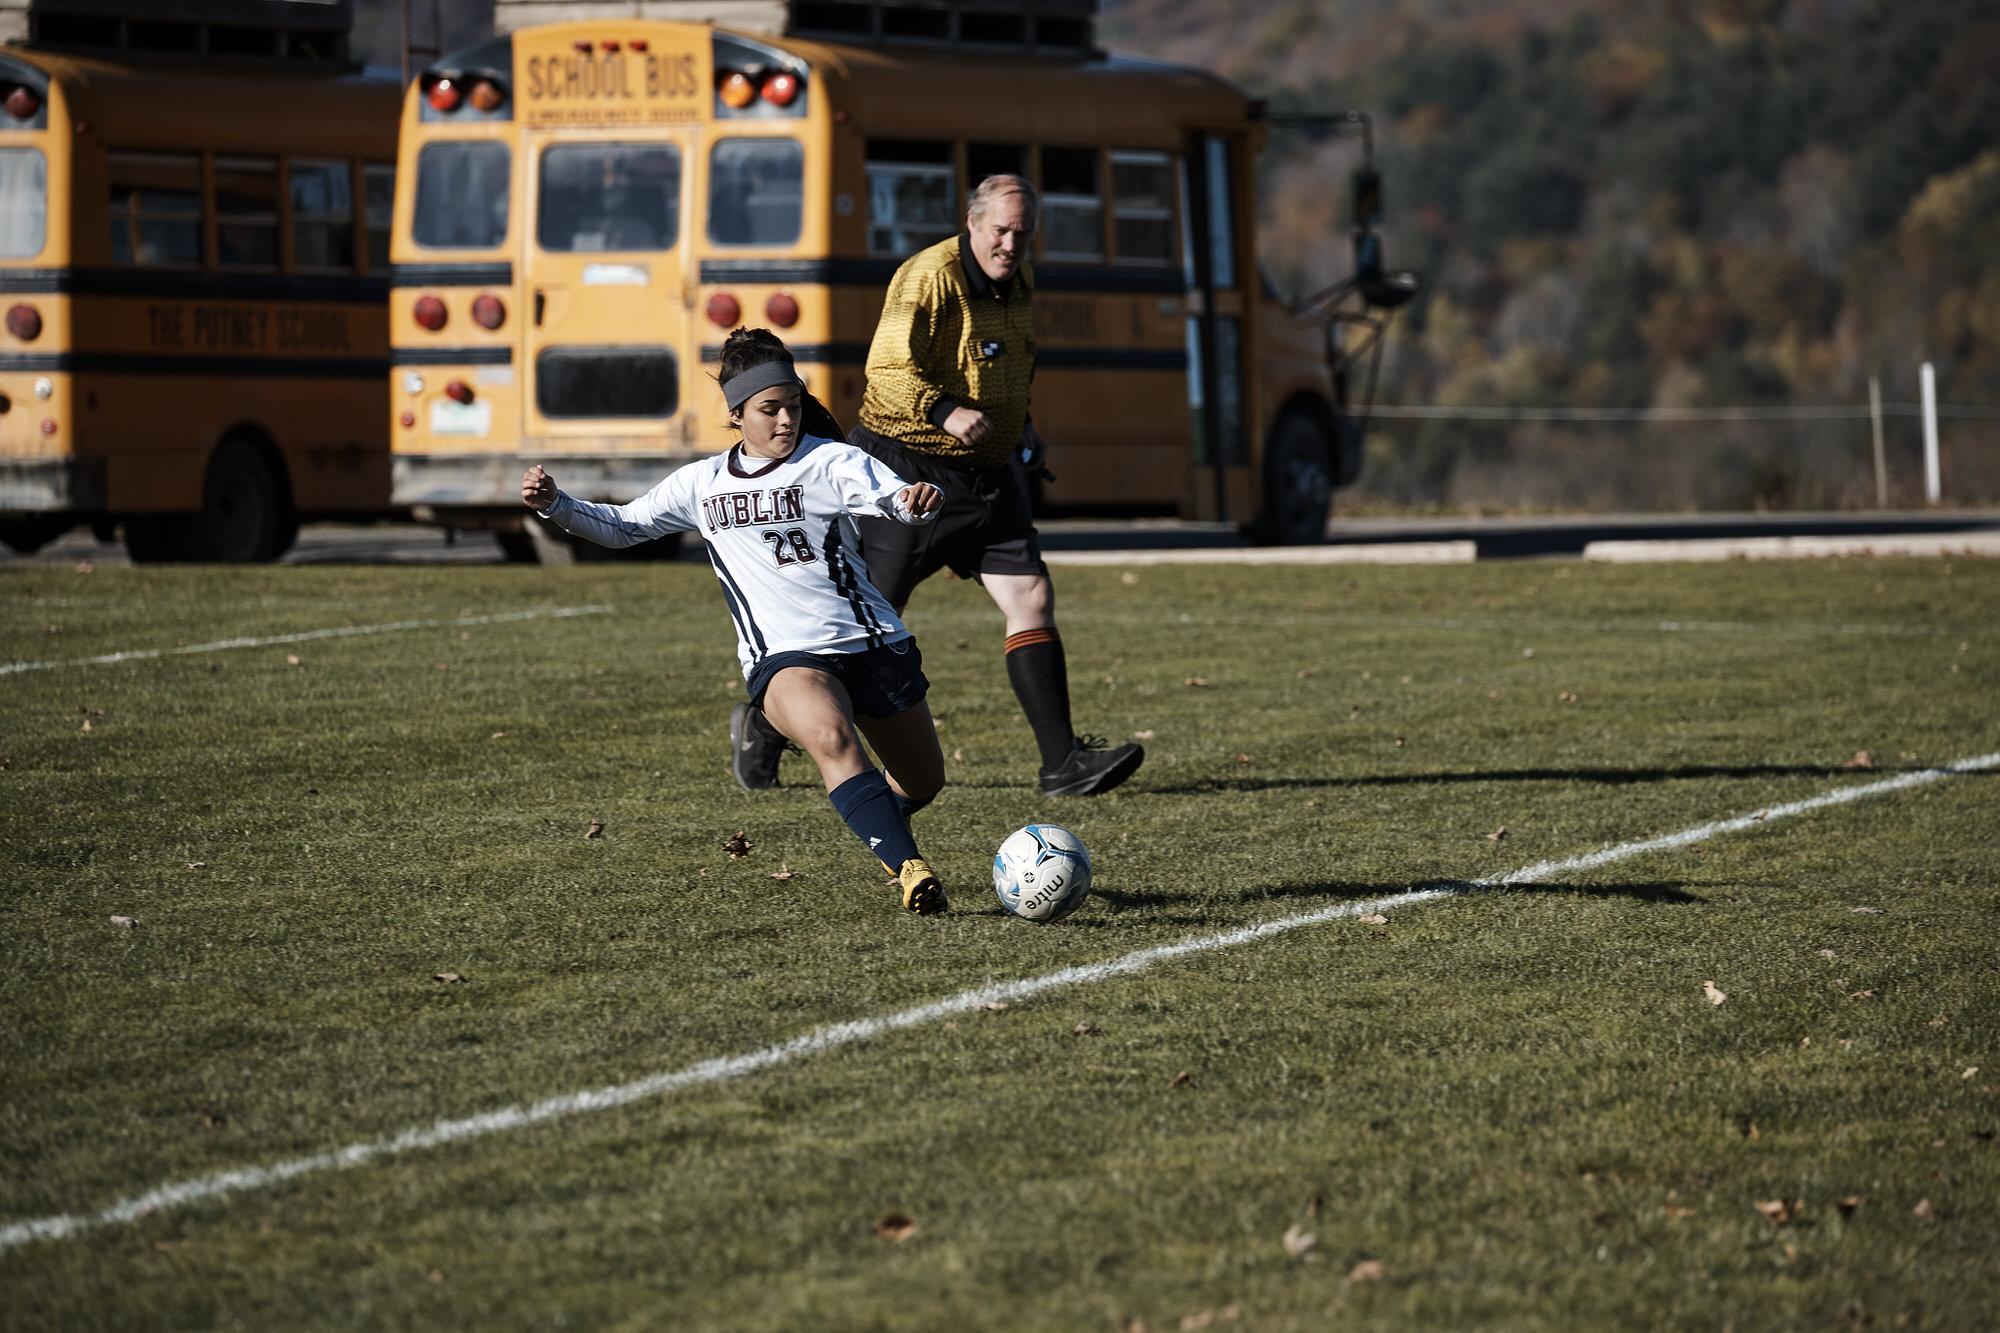 Girls Varsity Soccer vs. Putney School - October 26, 2018 - 008.jpg